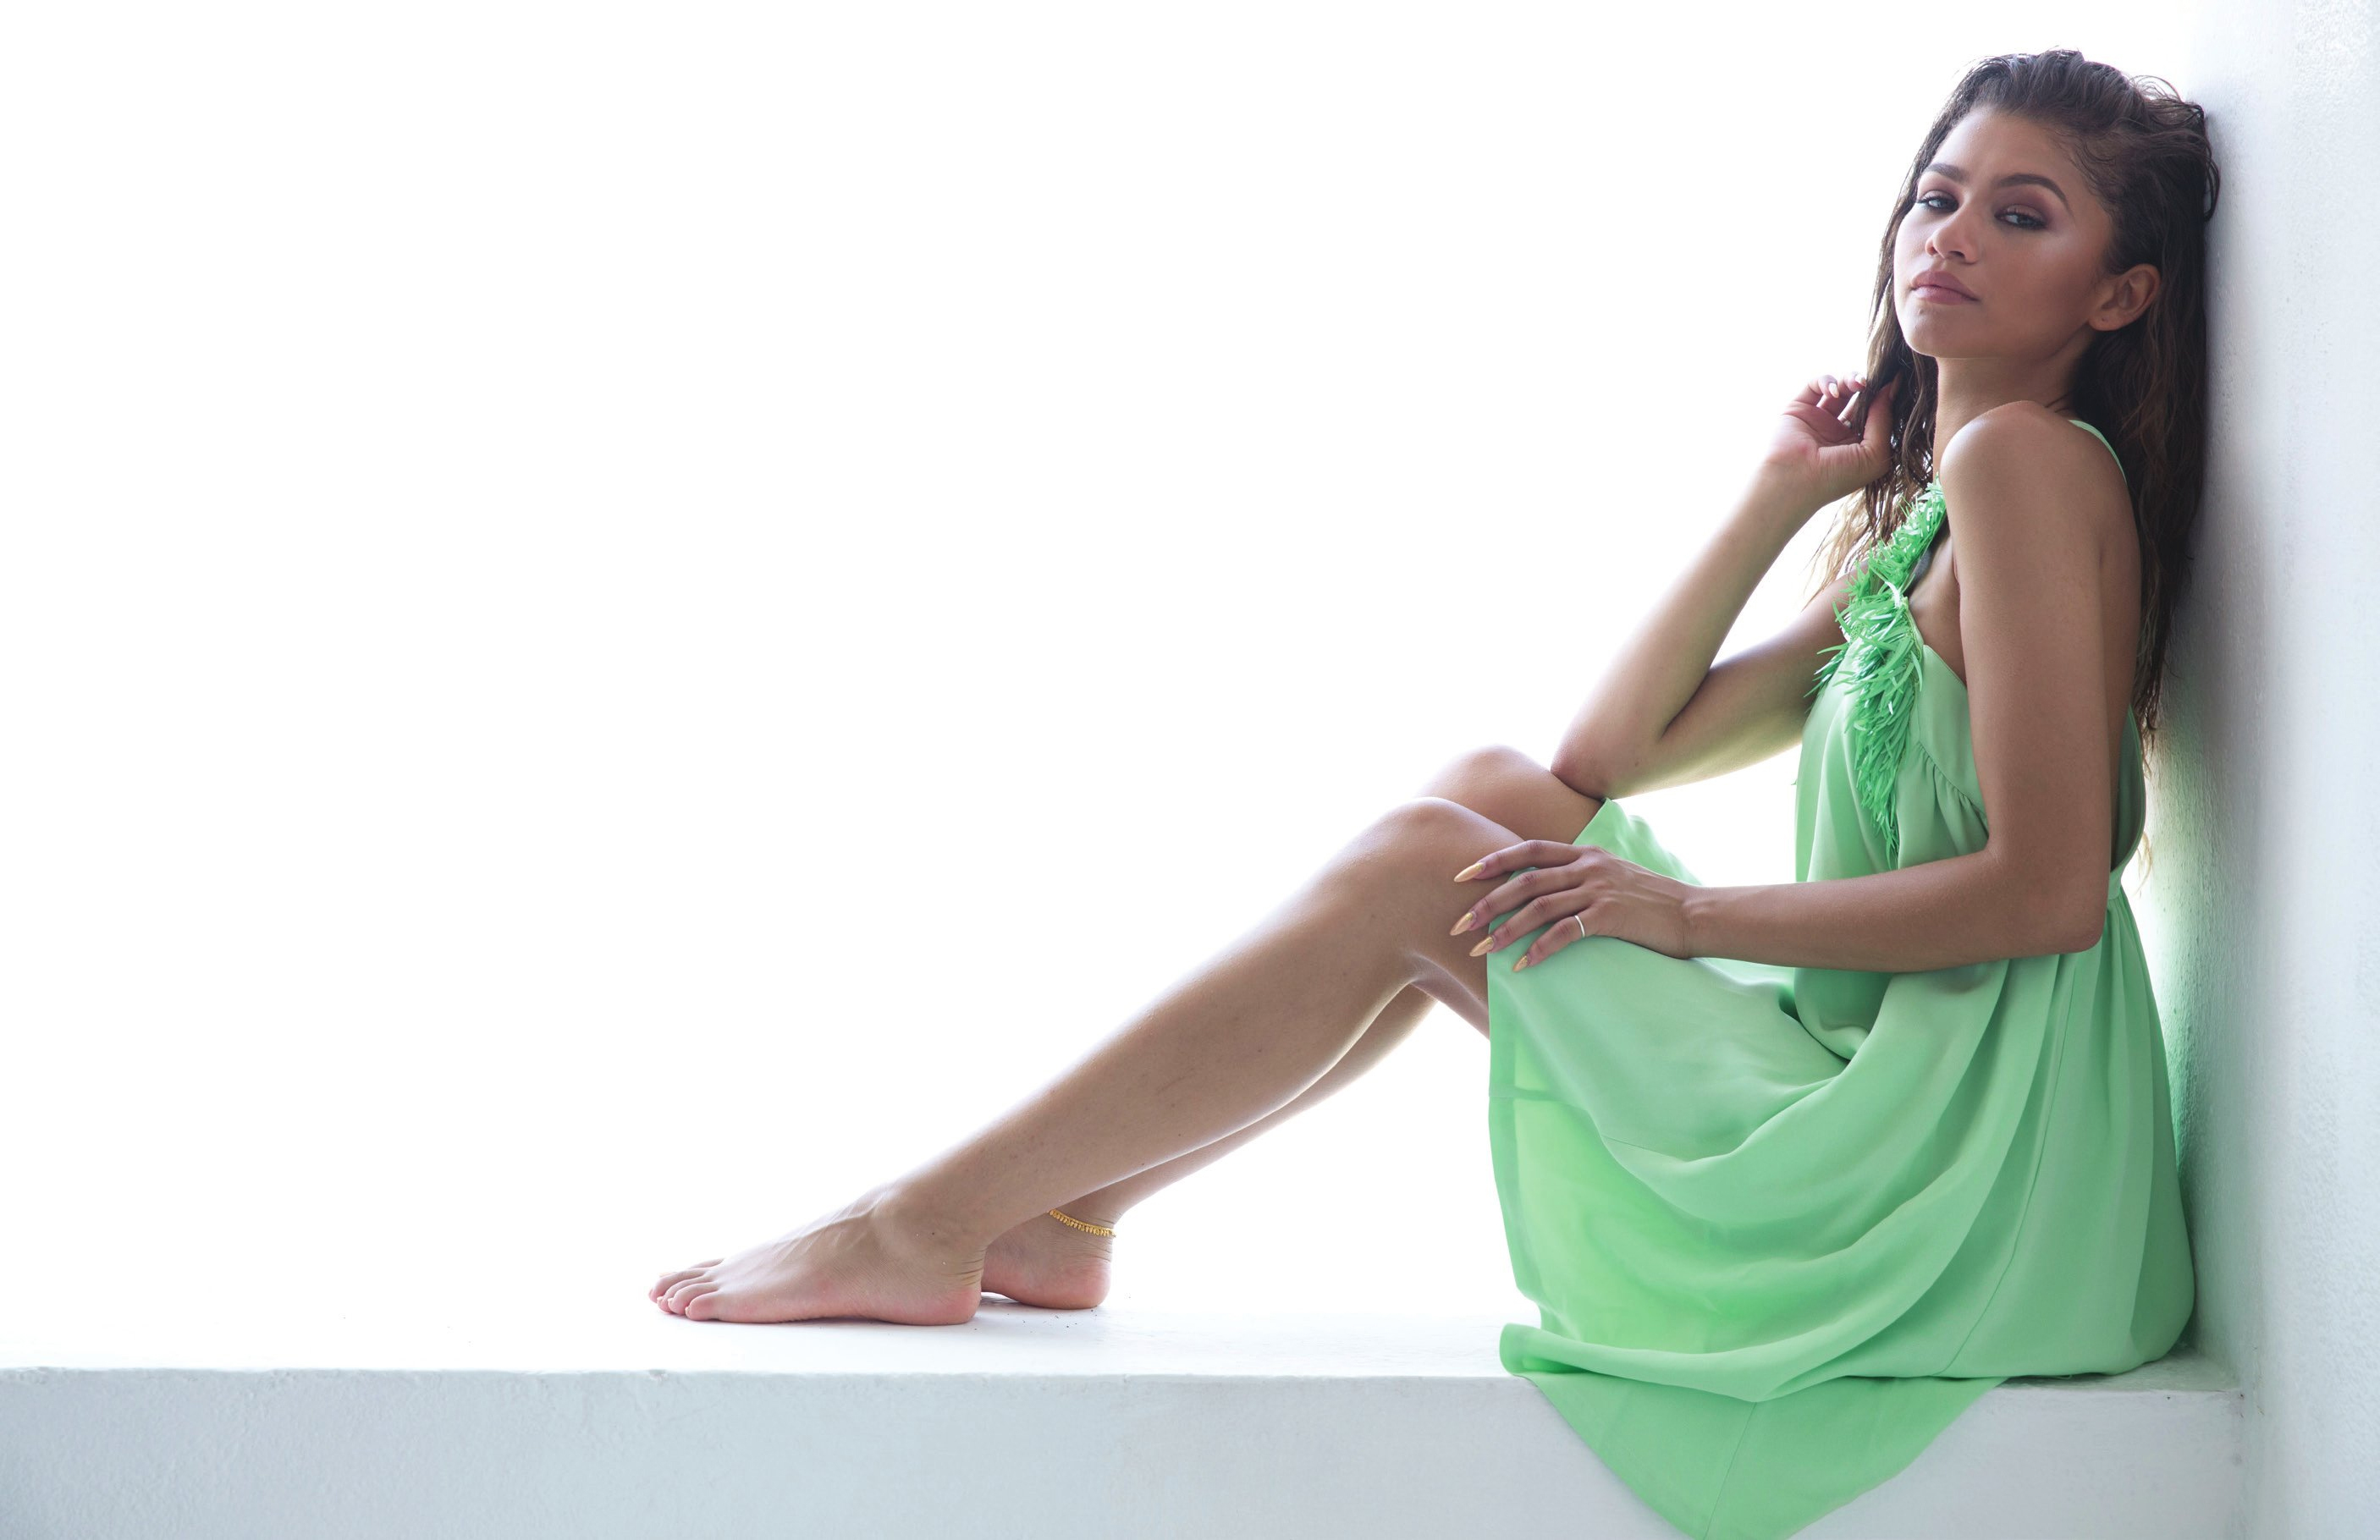 Zendaya Wallpapers, Pictures, Images Zendaya Feet